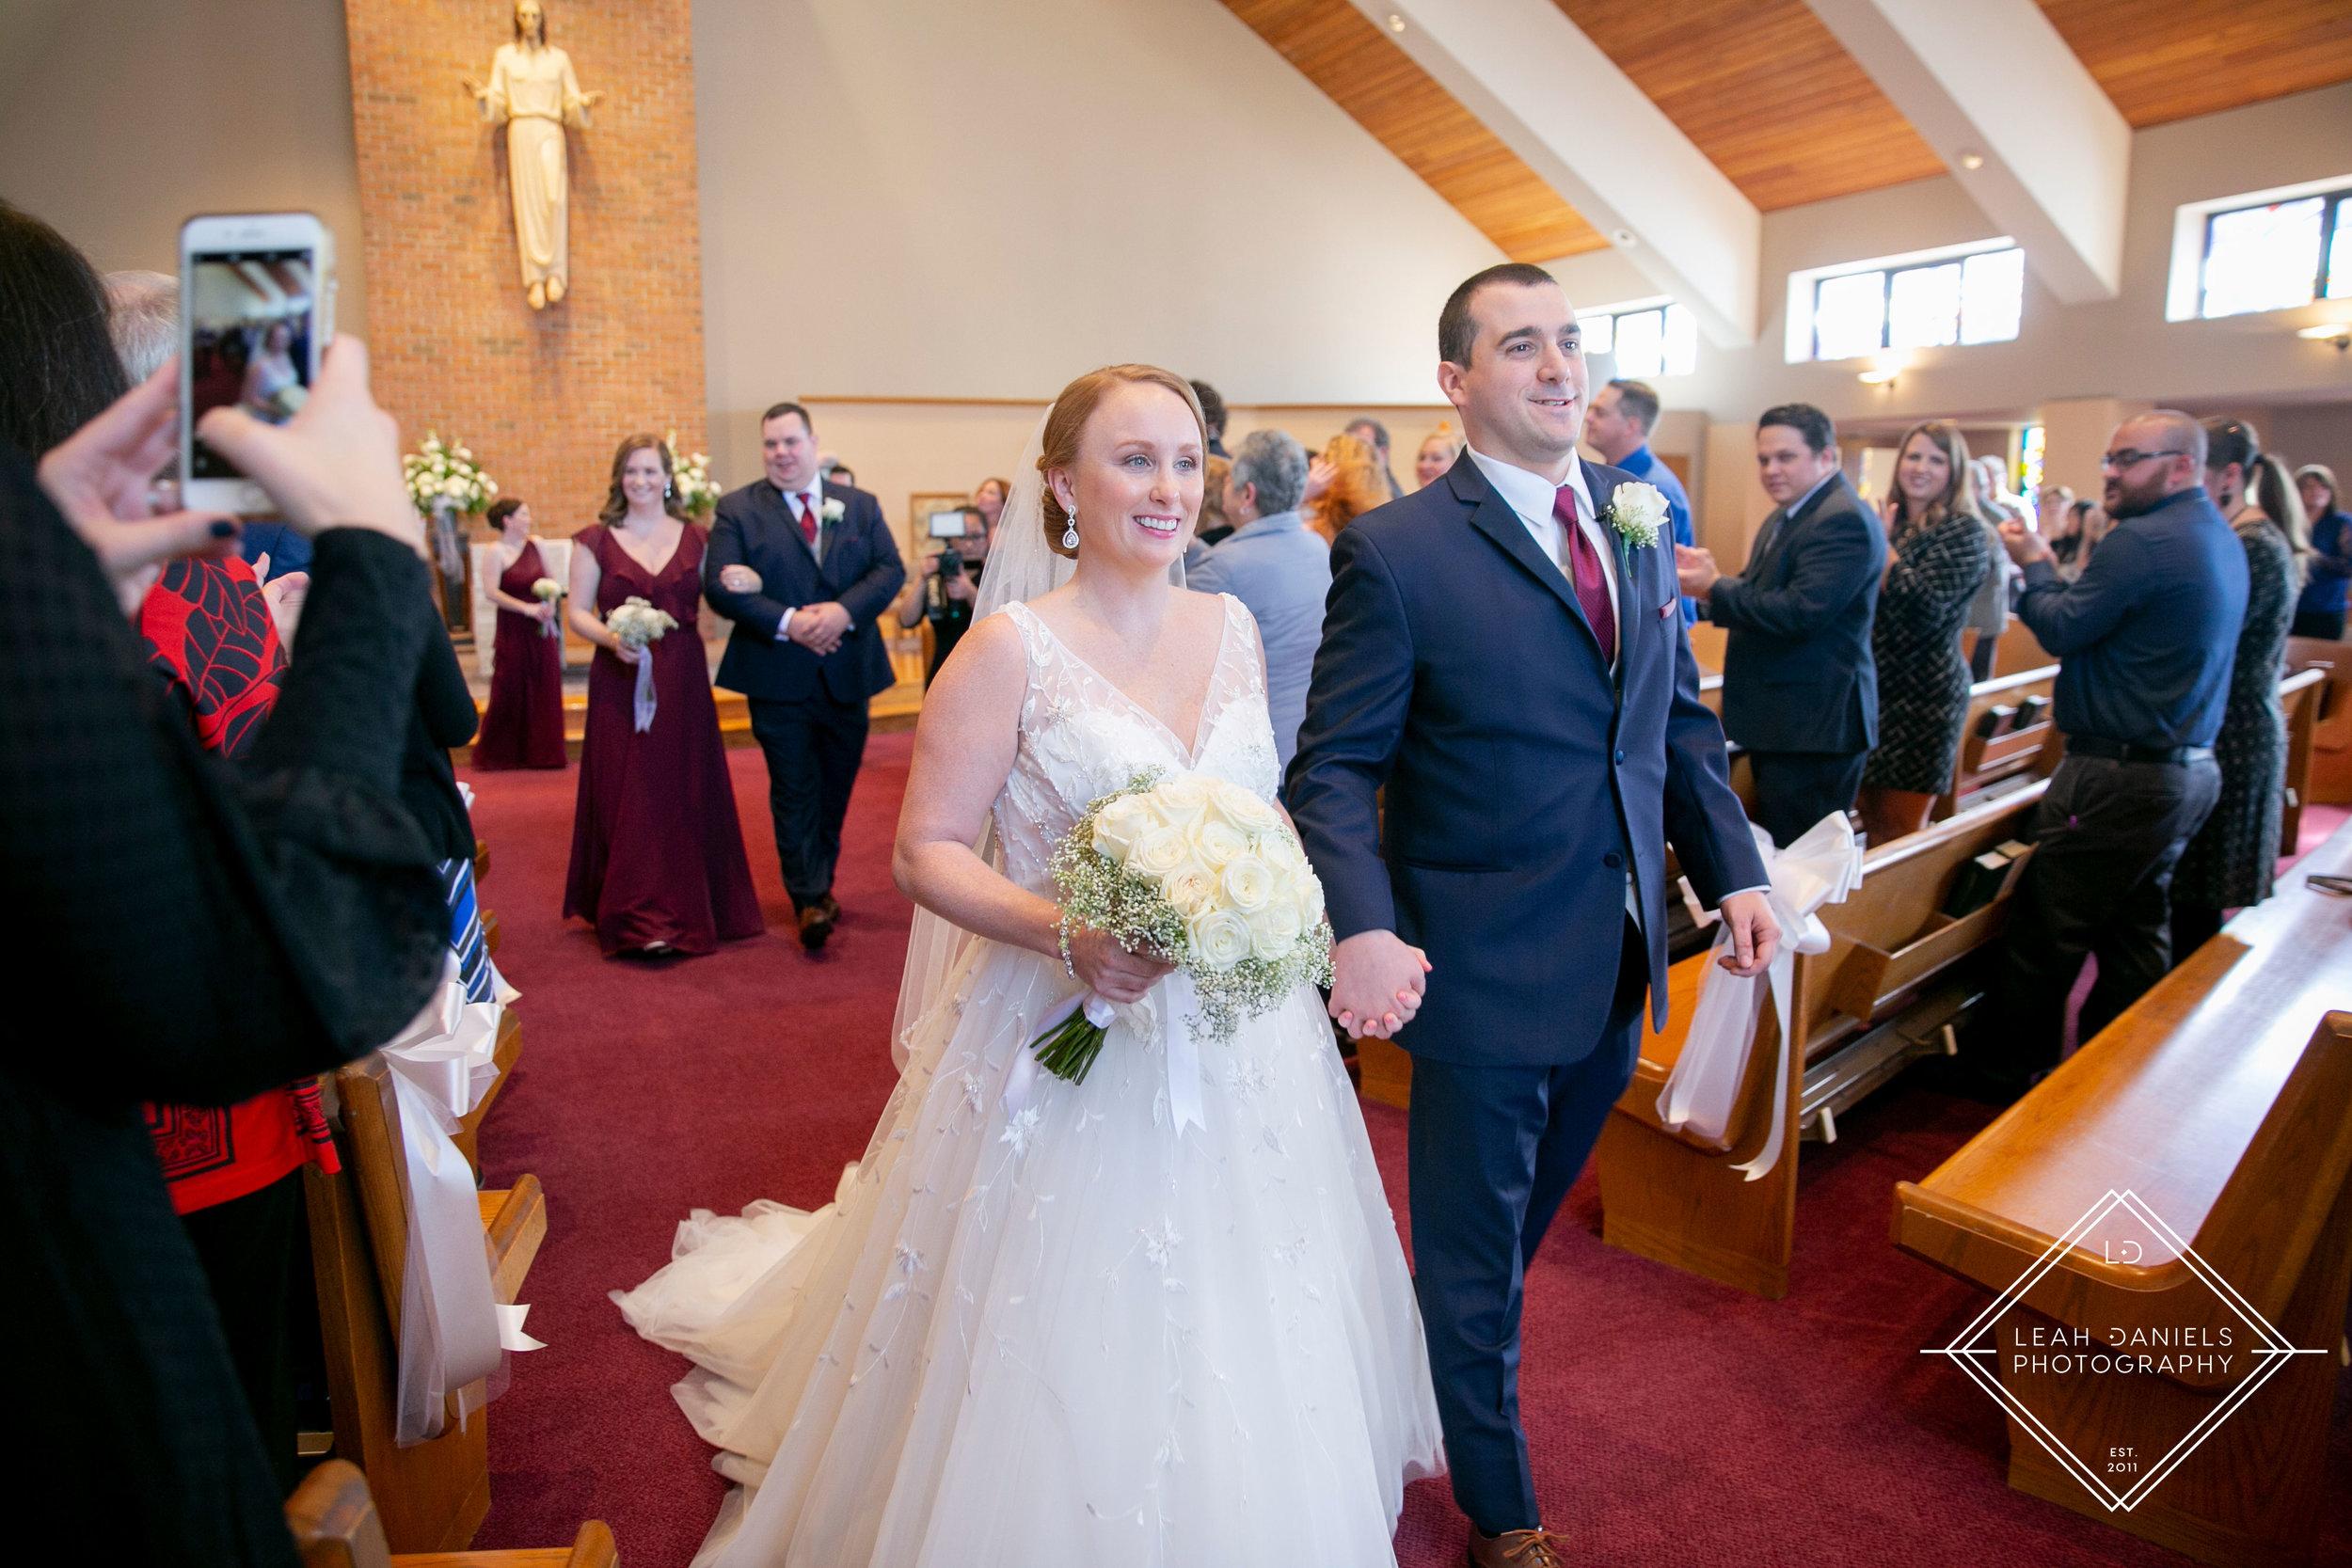 Scranton Wedding Photography - Just married